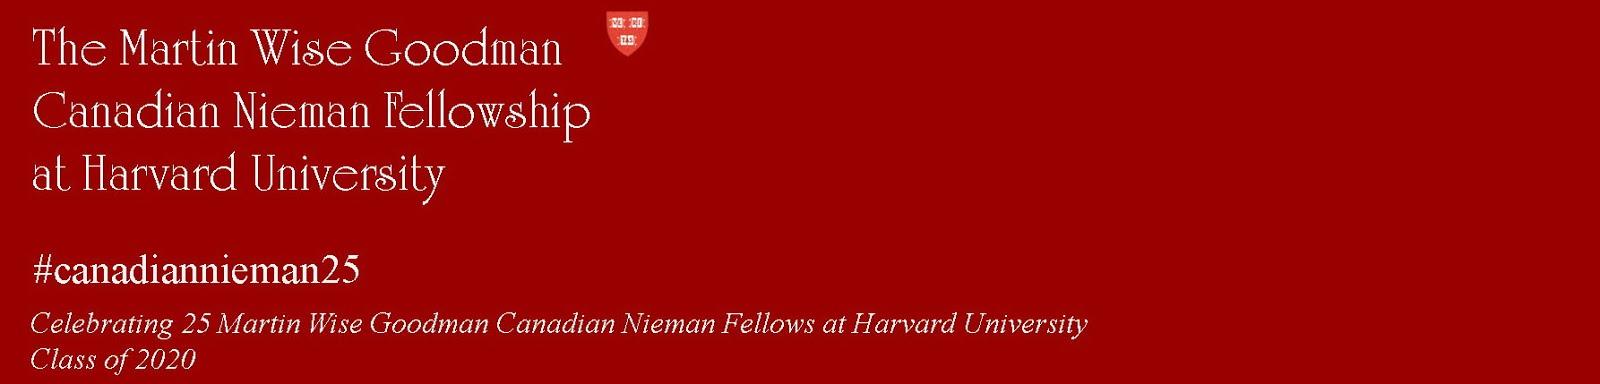 The Martin Wise Goodman Canadian Nieman Fellowship at Harvard